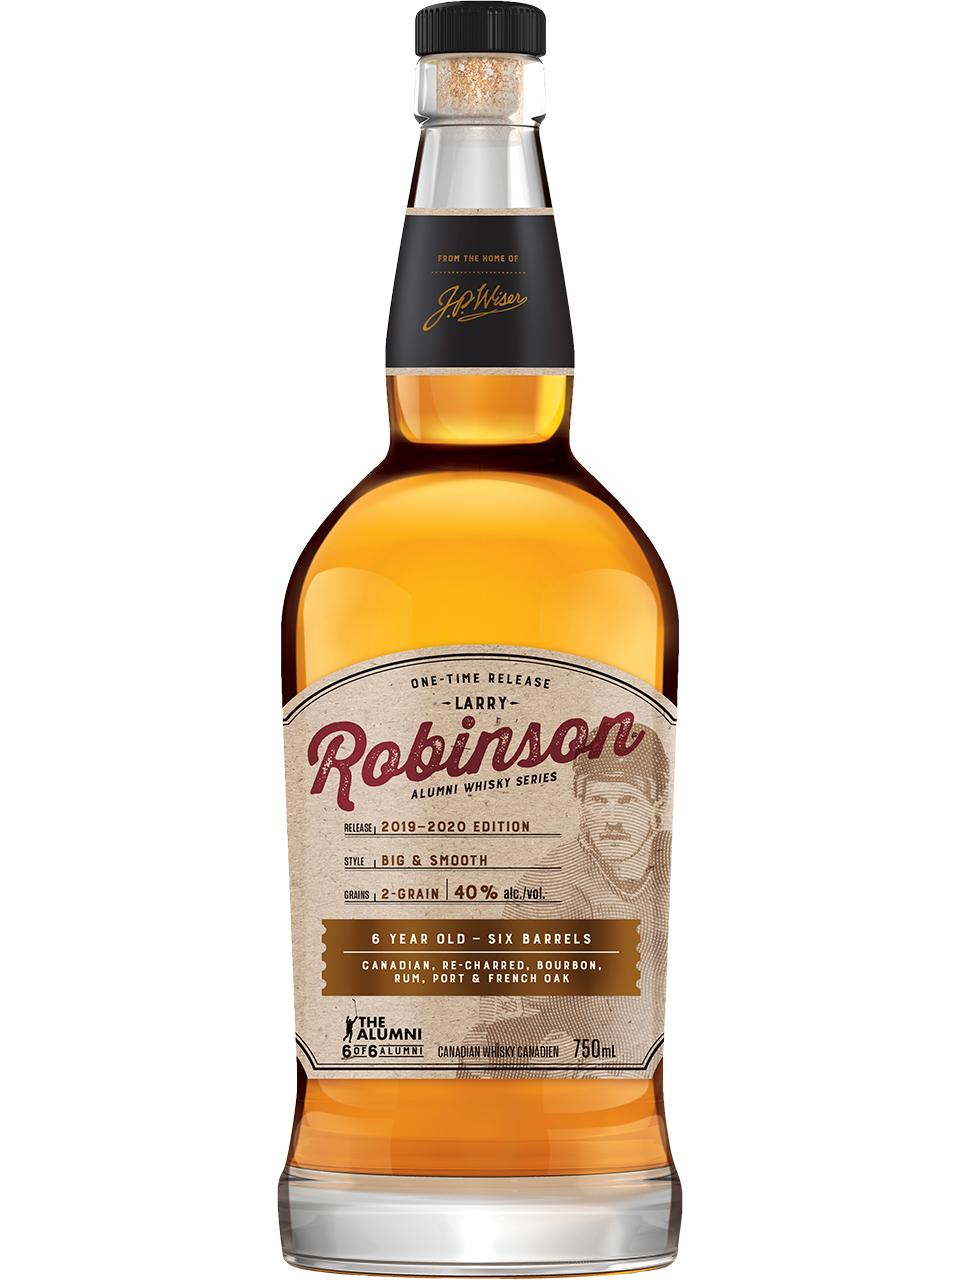 Larry Robinson Alumni Series Whisky